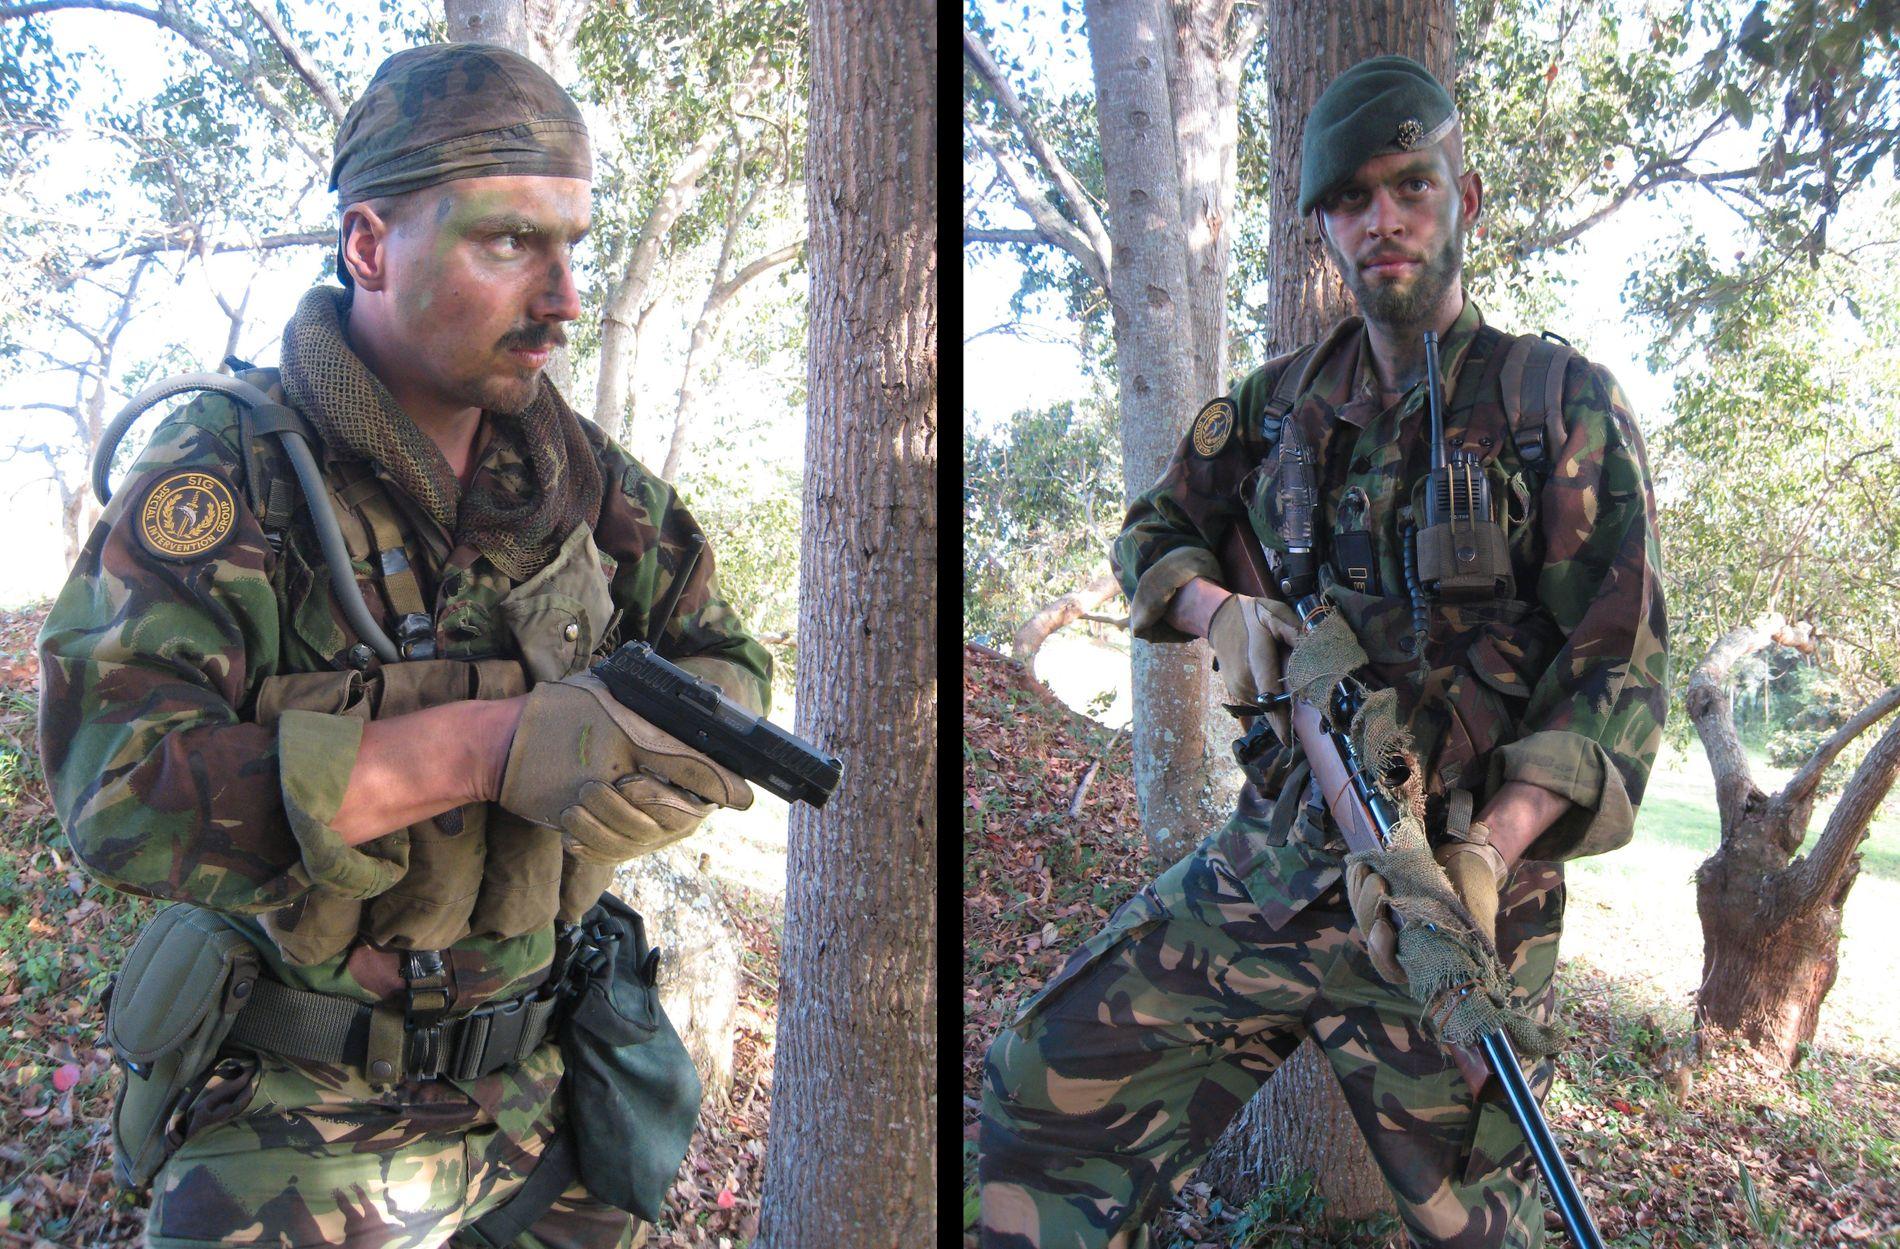 TRENING: Tjostolv Moland og Joshua French på trening for leiesoldatfirmaet SIG Uganda.